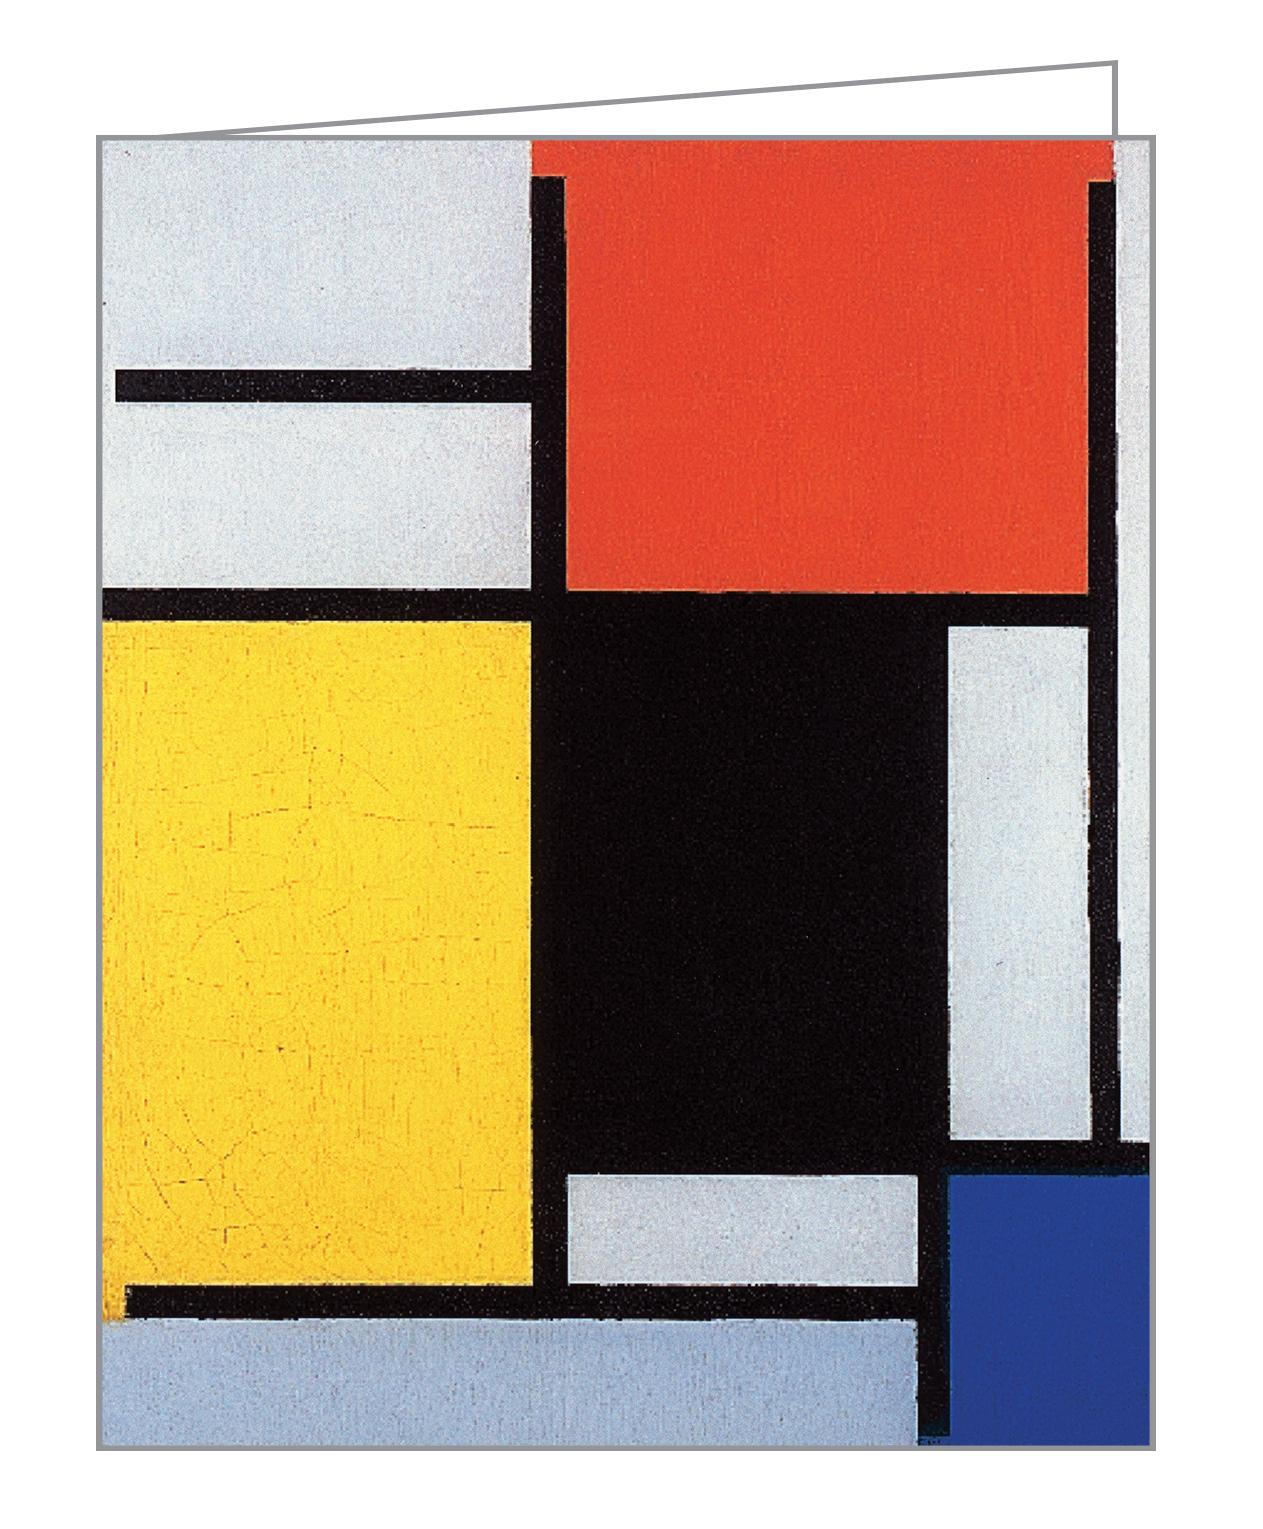 Piet Mondrian QuickNotes